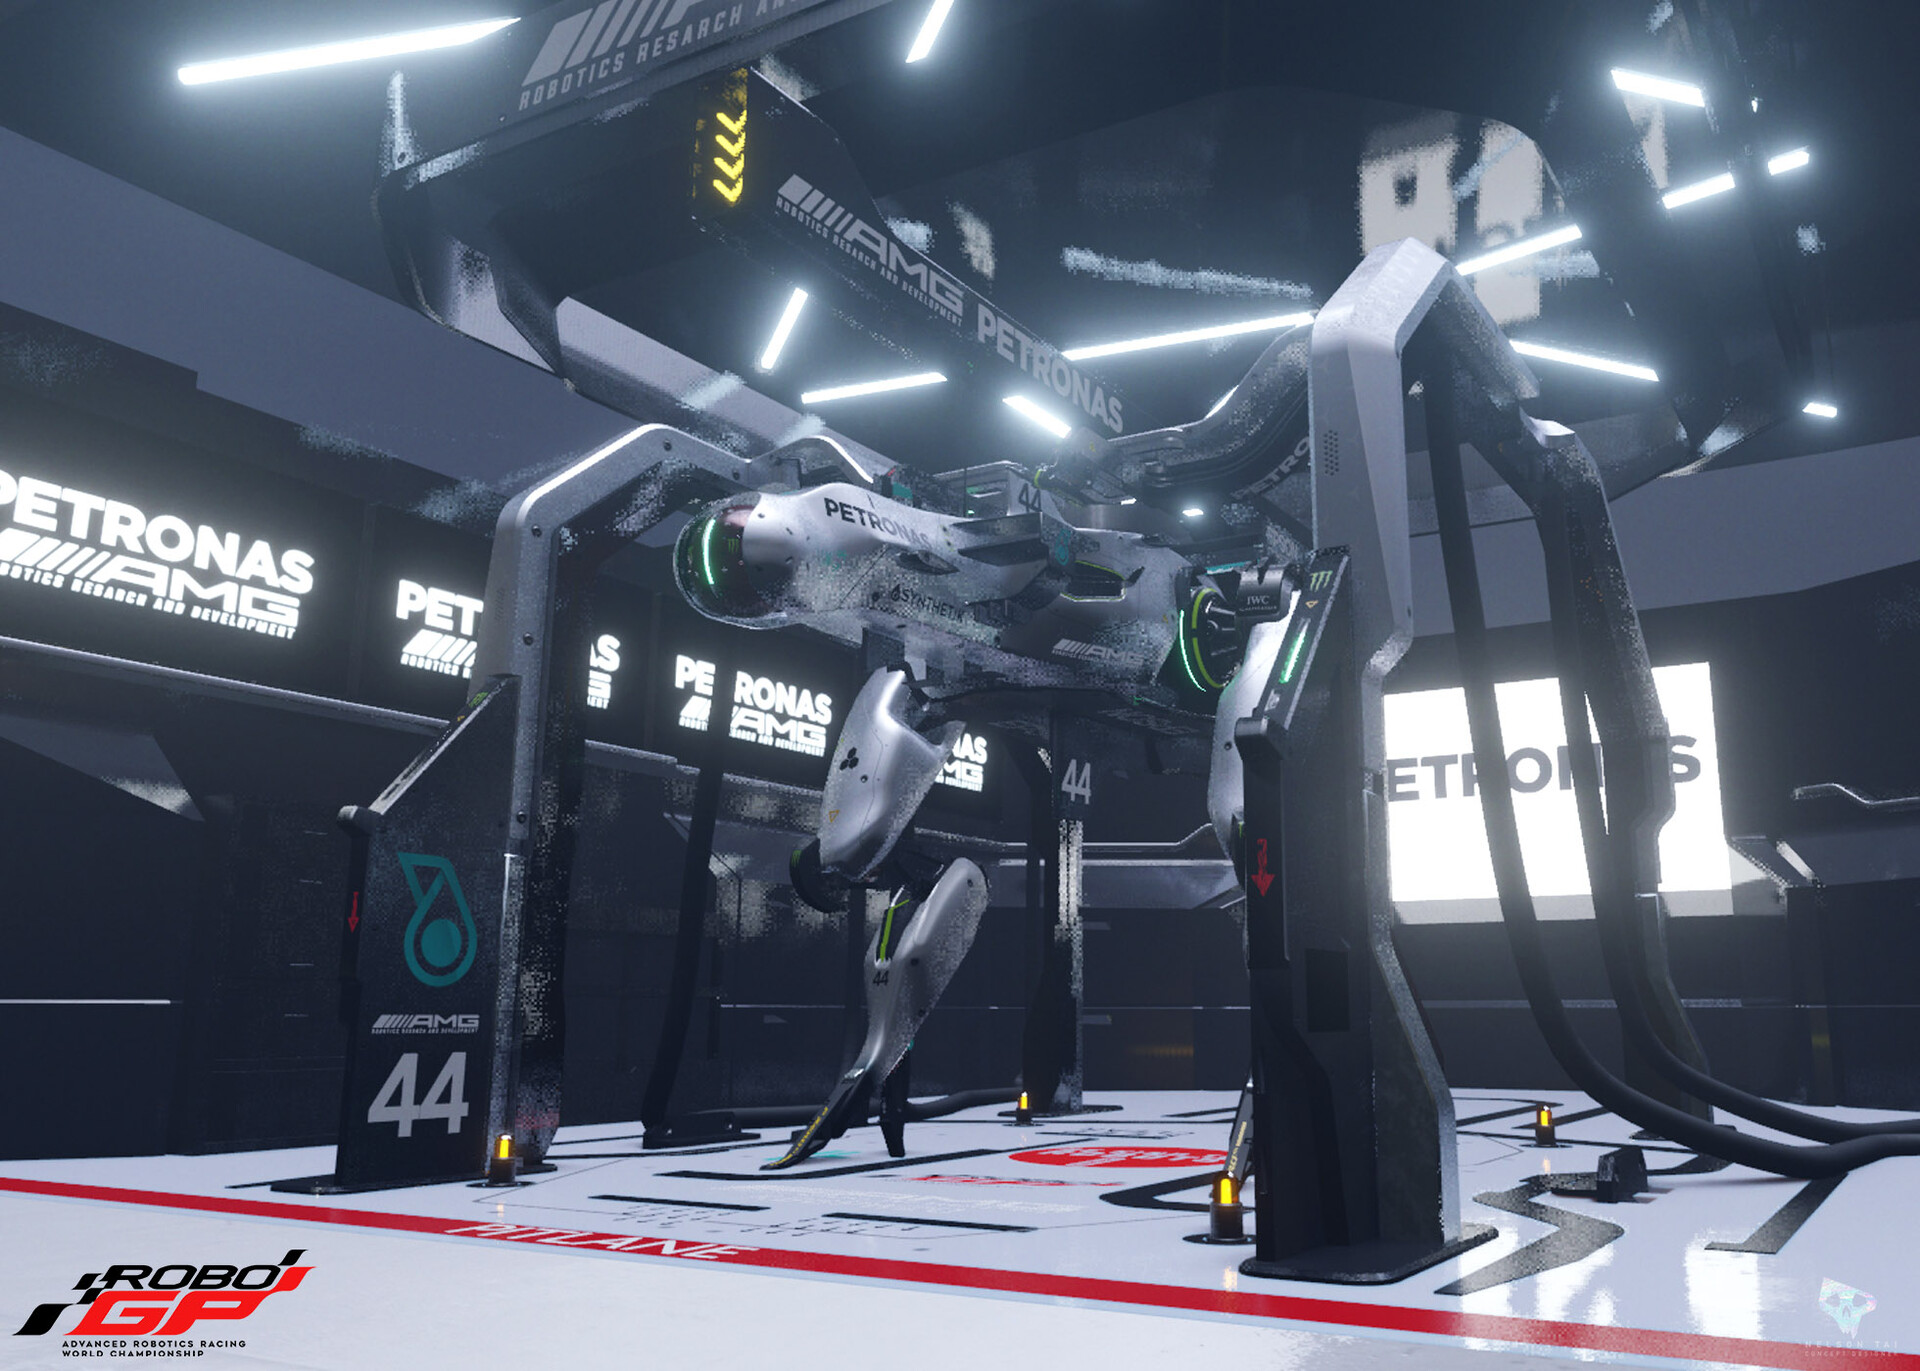 blender viewport - The Garage